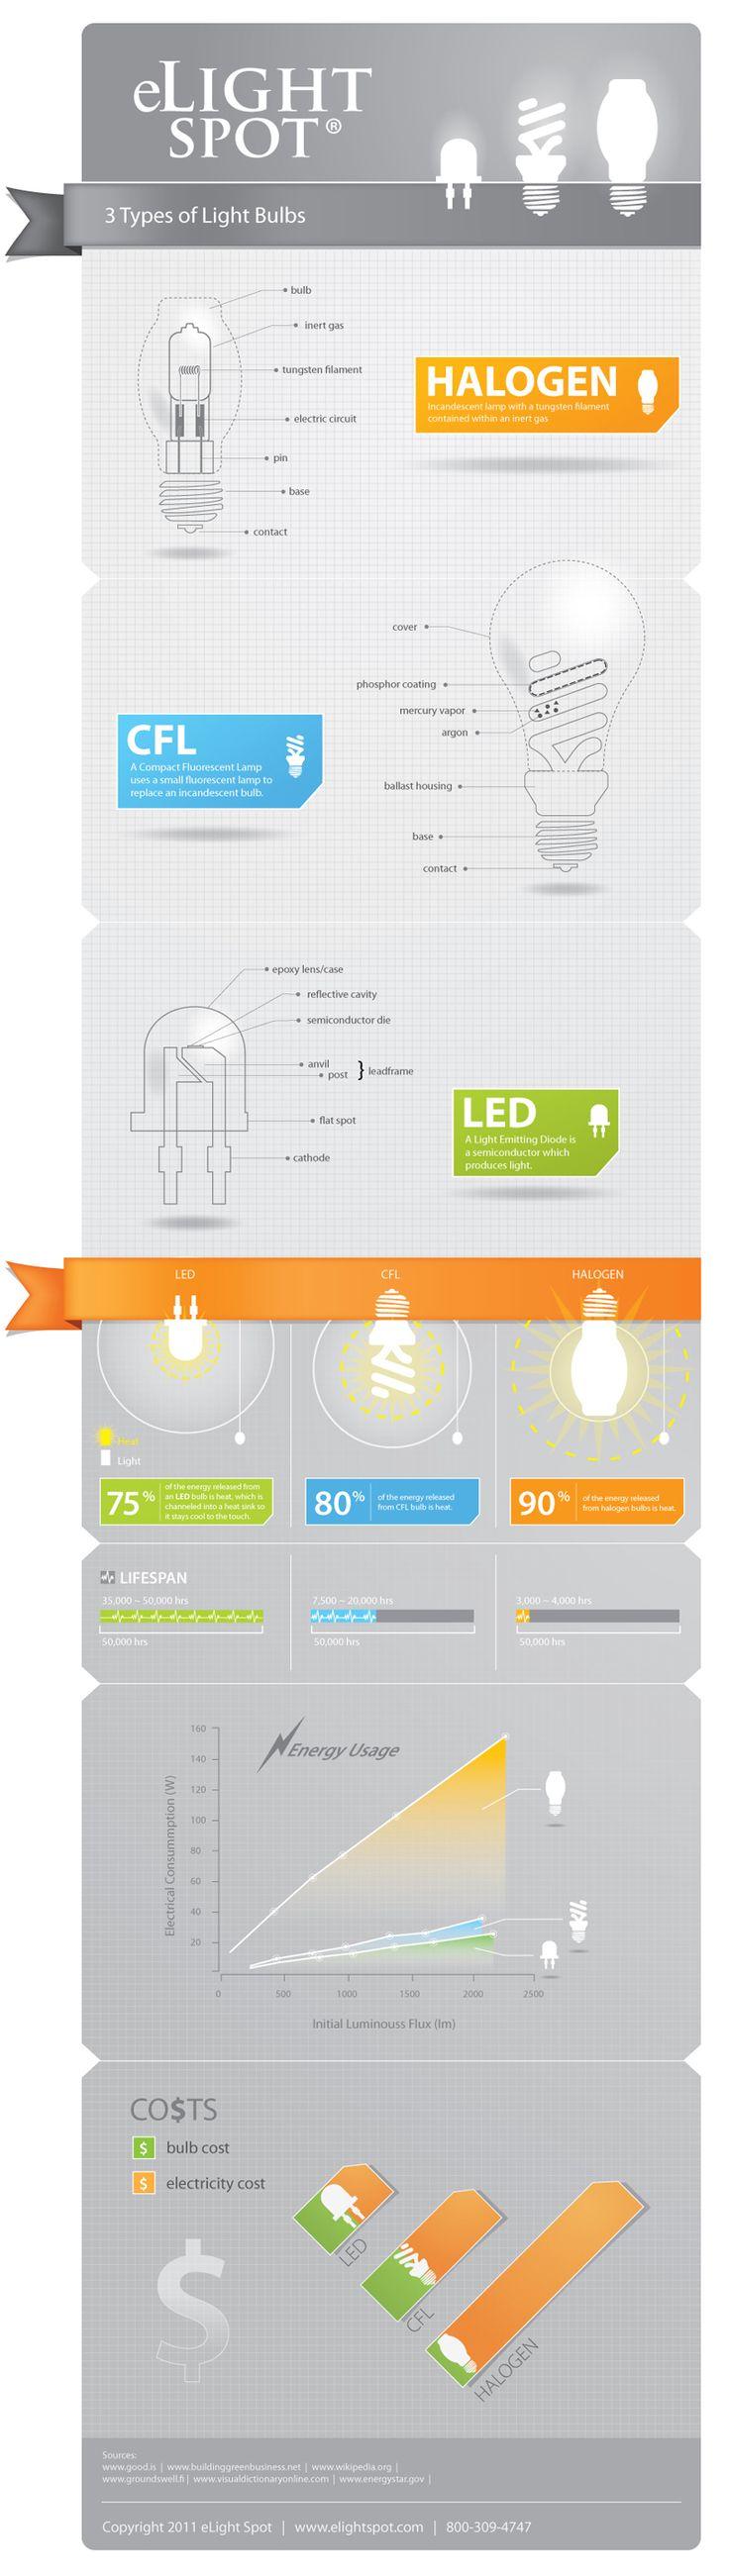 hight resolution of hal genos vs bajo consumo vs led infografia medioambiente lamp design lighting designwall